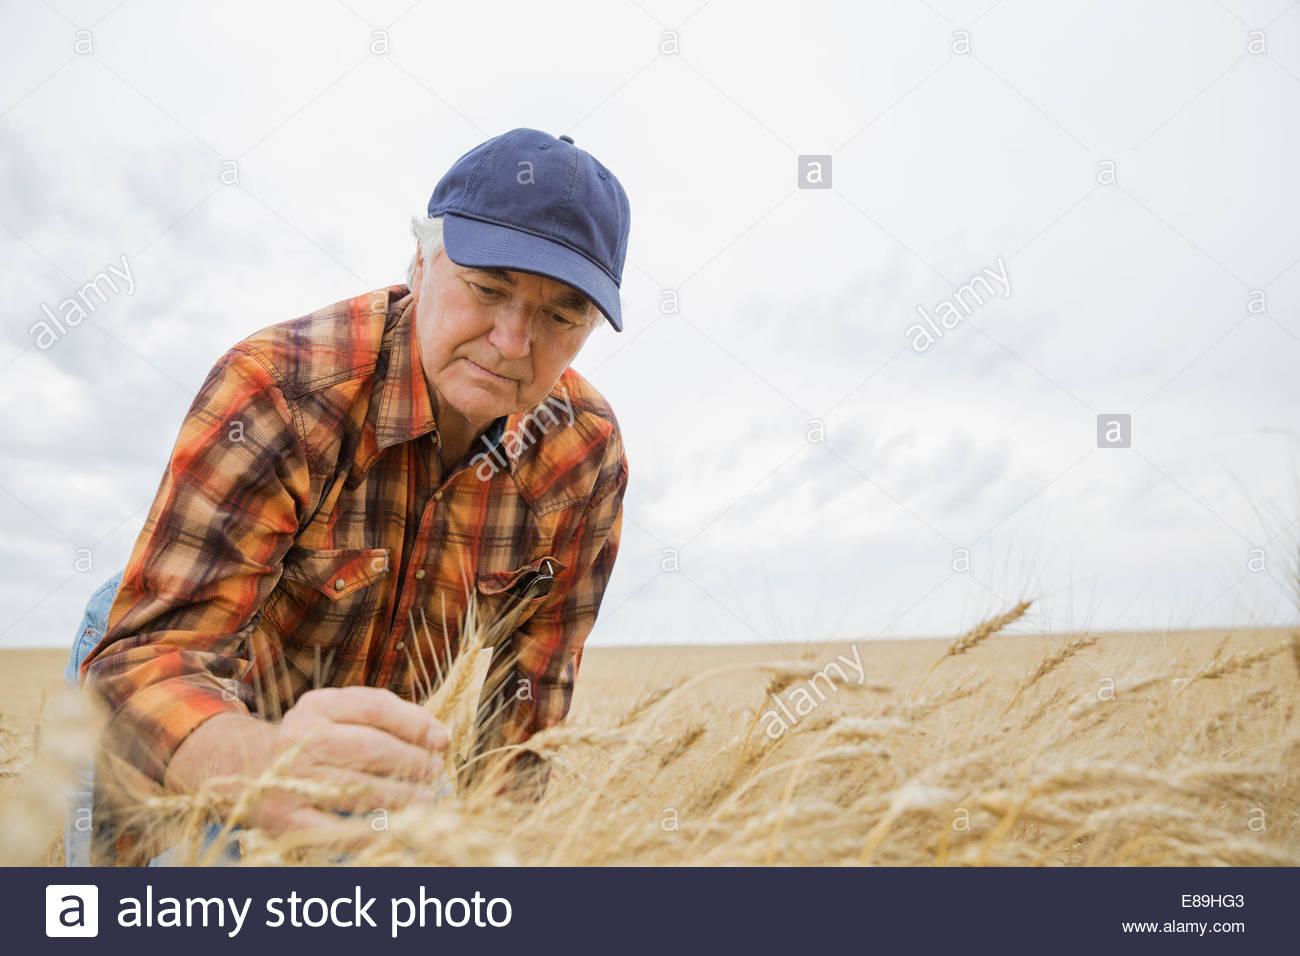 Farmer examining wheat crop - Stock Image